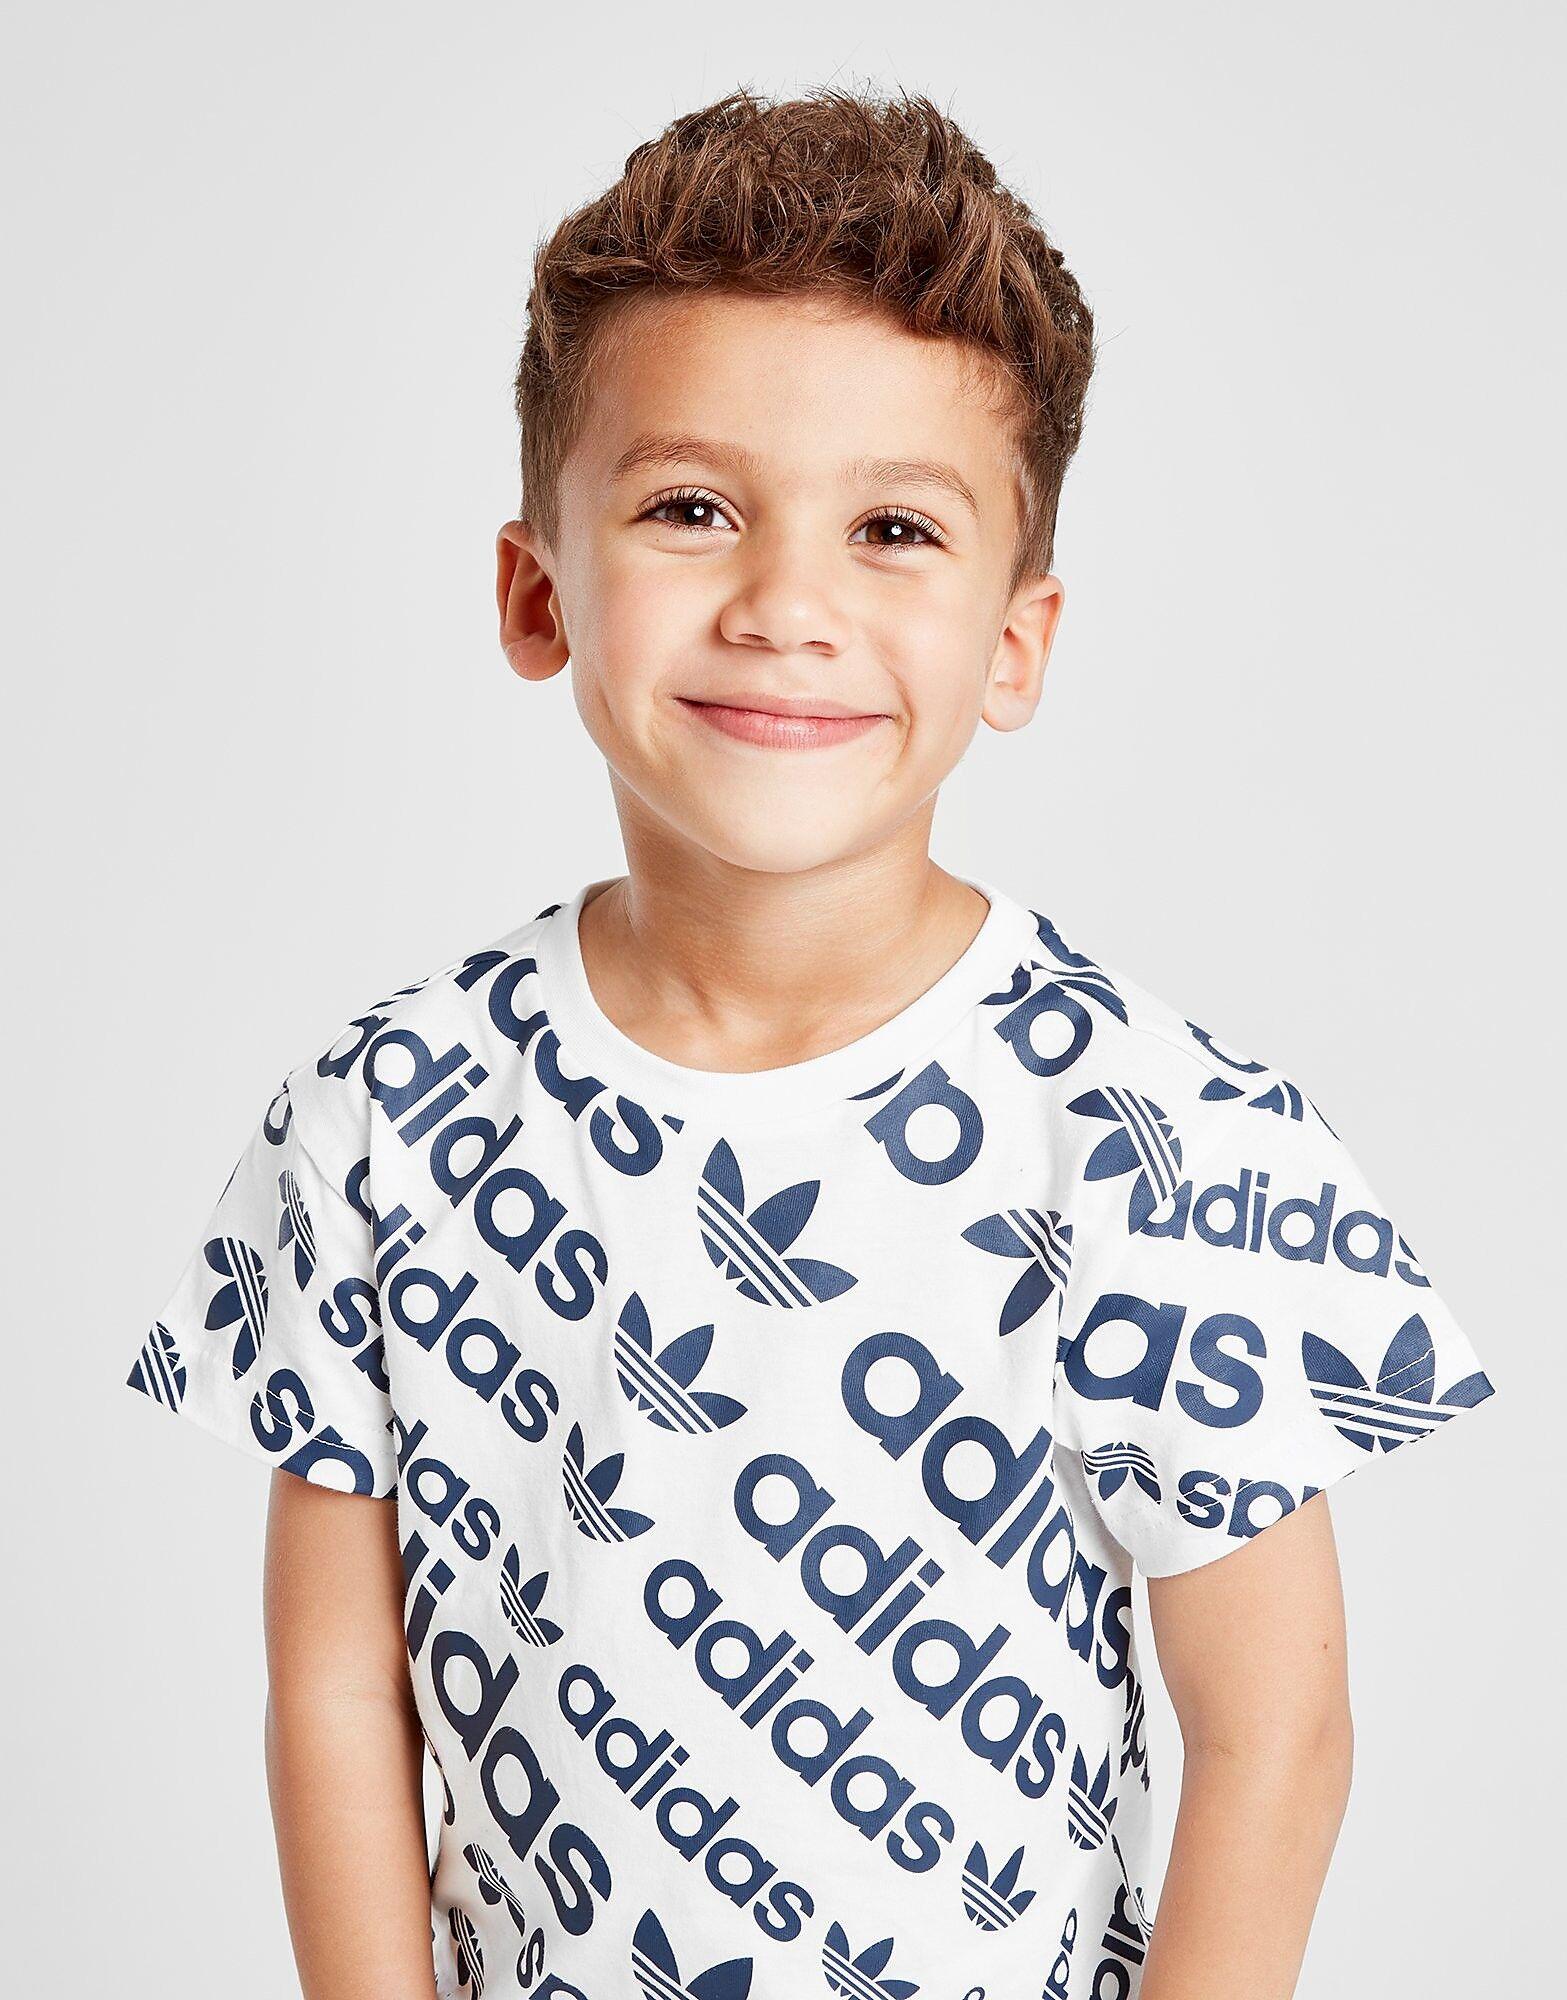 Image of Adidas Originals T-paita Lapset - Only at JD - Kids, Valkoinen